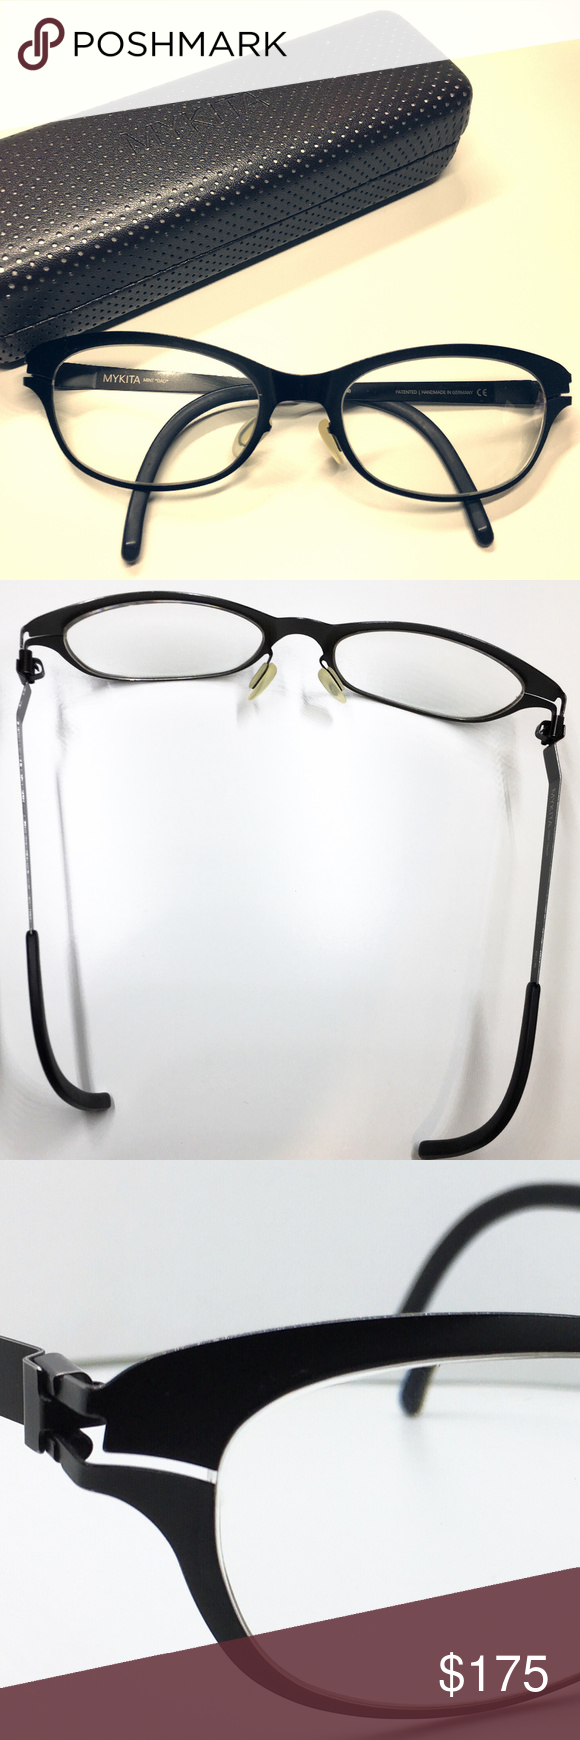 Mykita Mint DAO titanium prescription glass frame Mykita